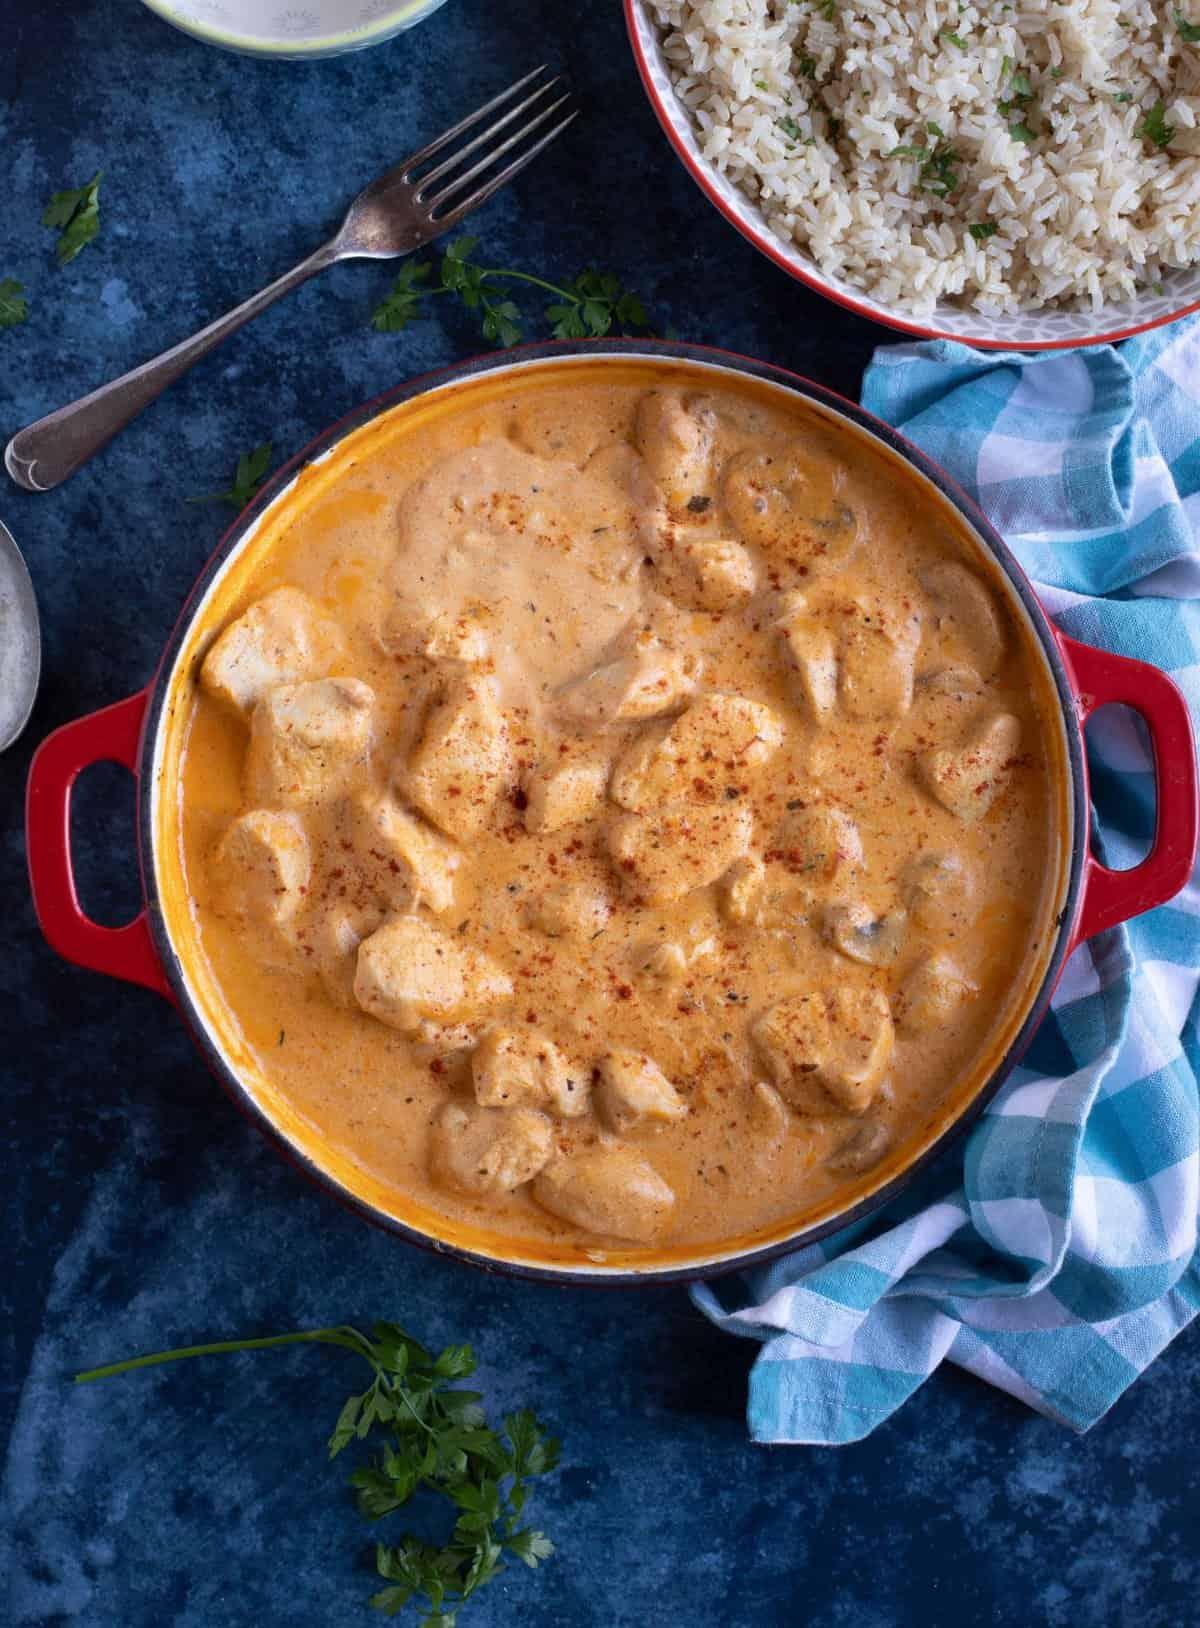 Chicken and mushroom stroganoff with brown rice.